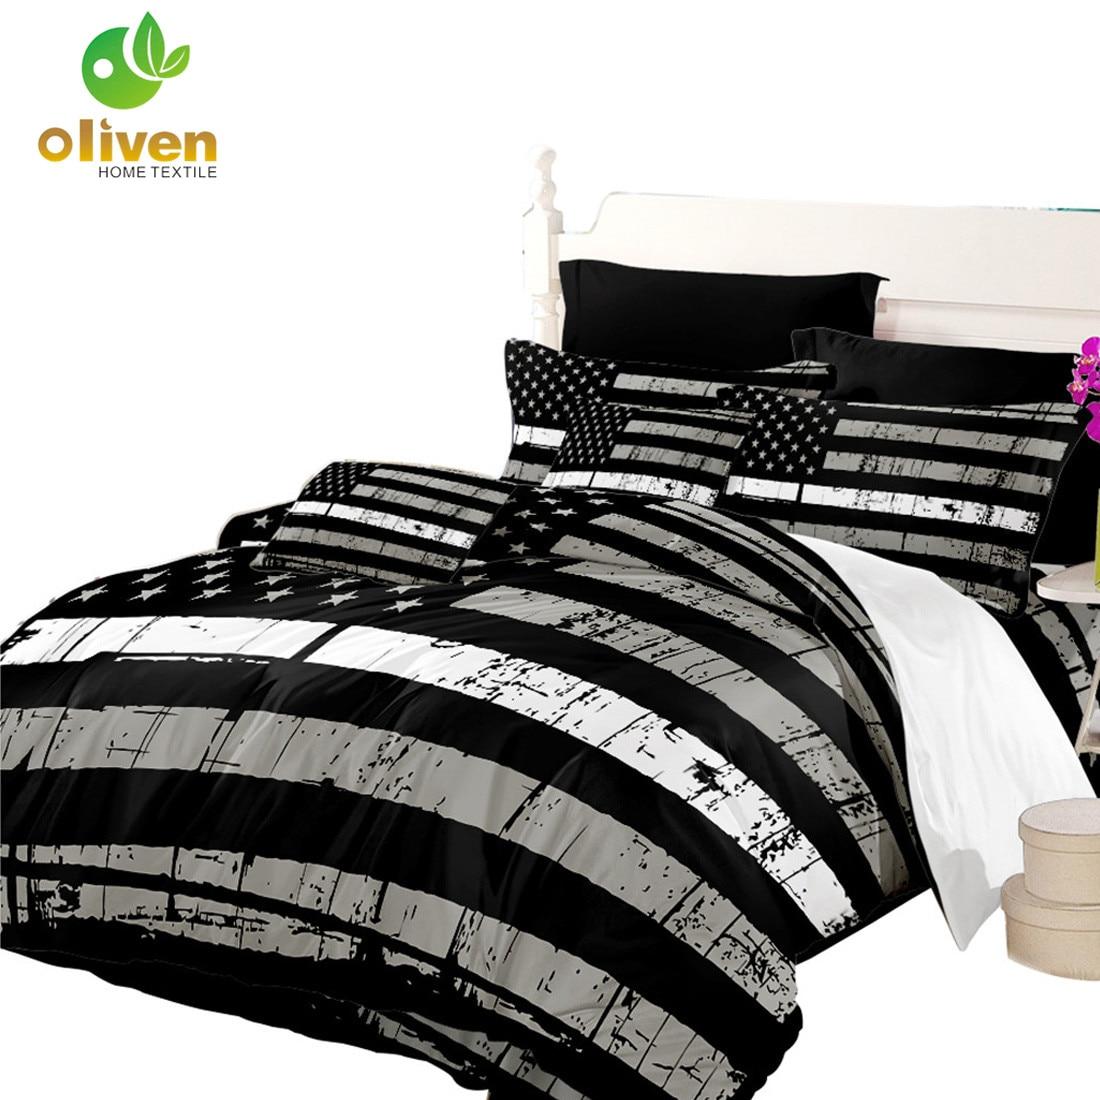 antique flag bedding set black white american flag design duvet cover set stars stripes bedding king queen bedclothes 3pcs d35